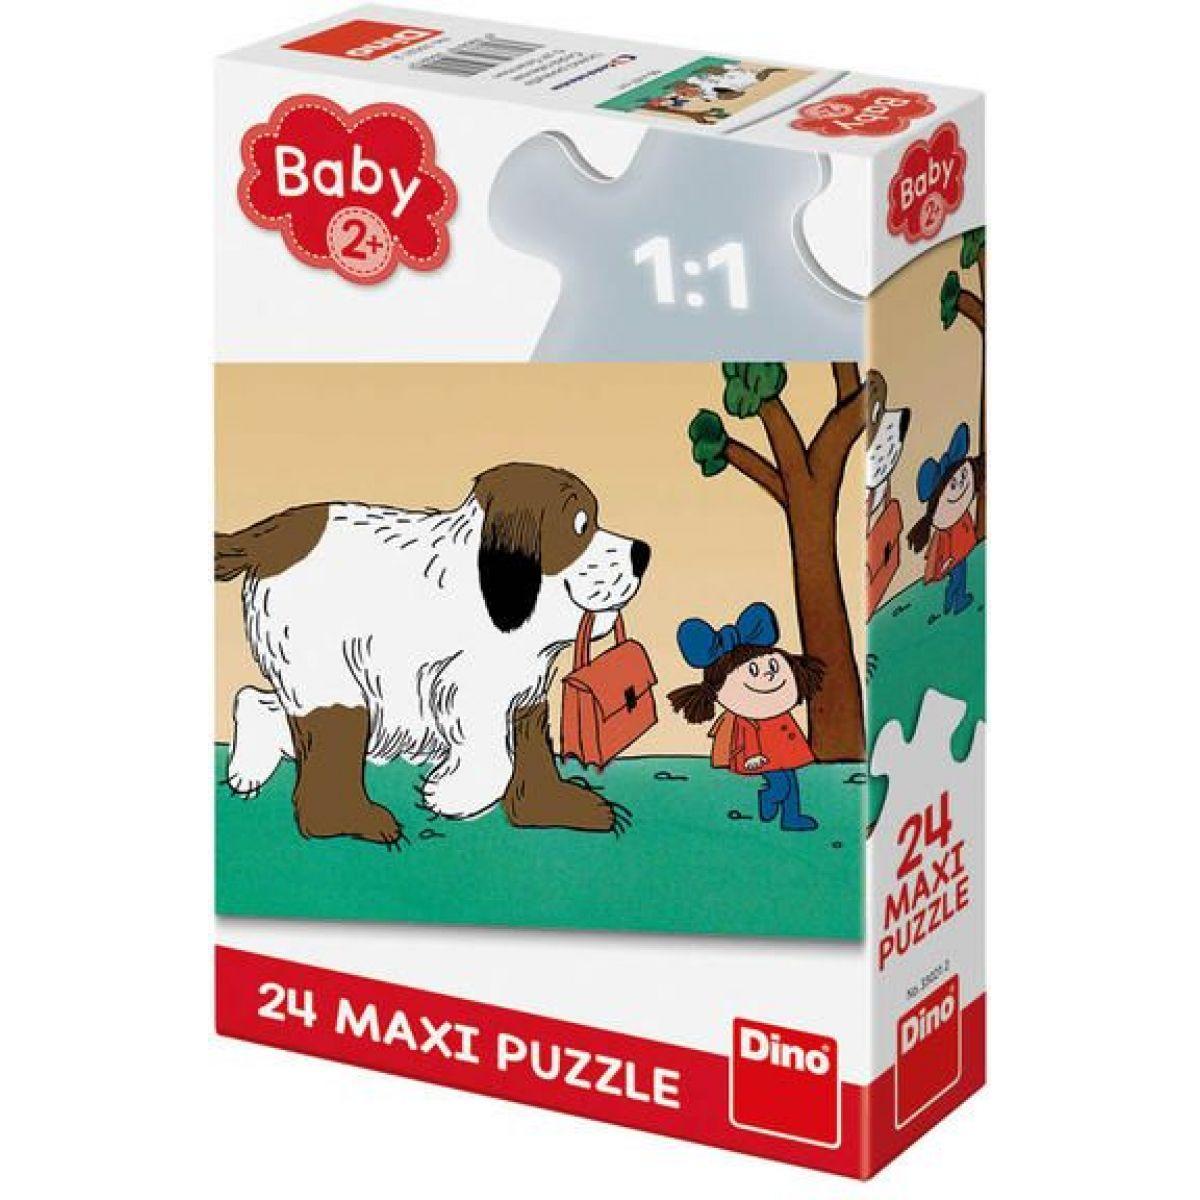 Dino Maxipes Fík maxi puzzle 24 dielikov